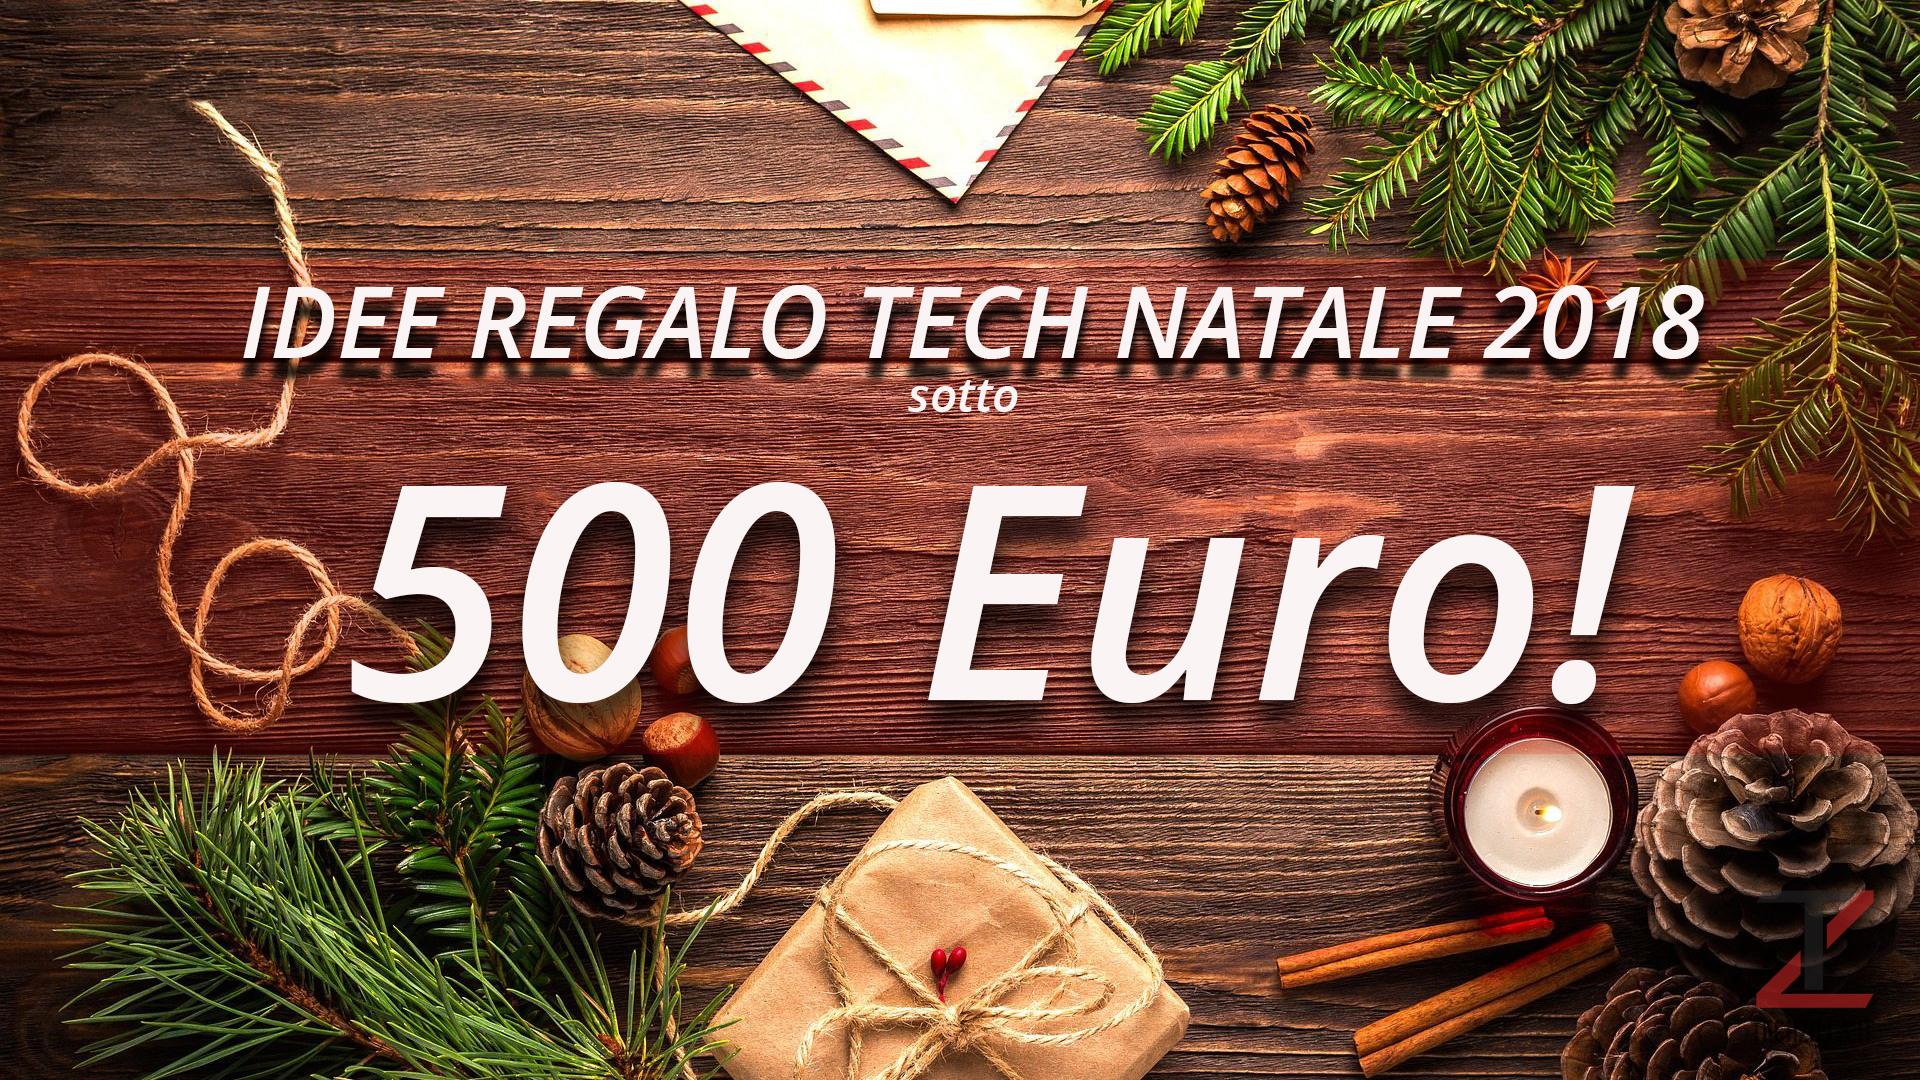 Idee regali tecnologici Natale 2018 500 euro